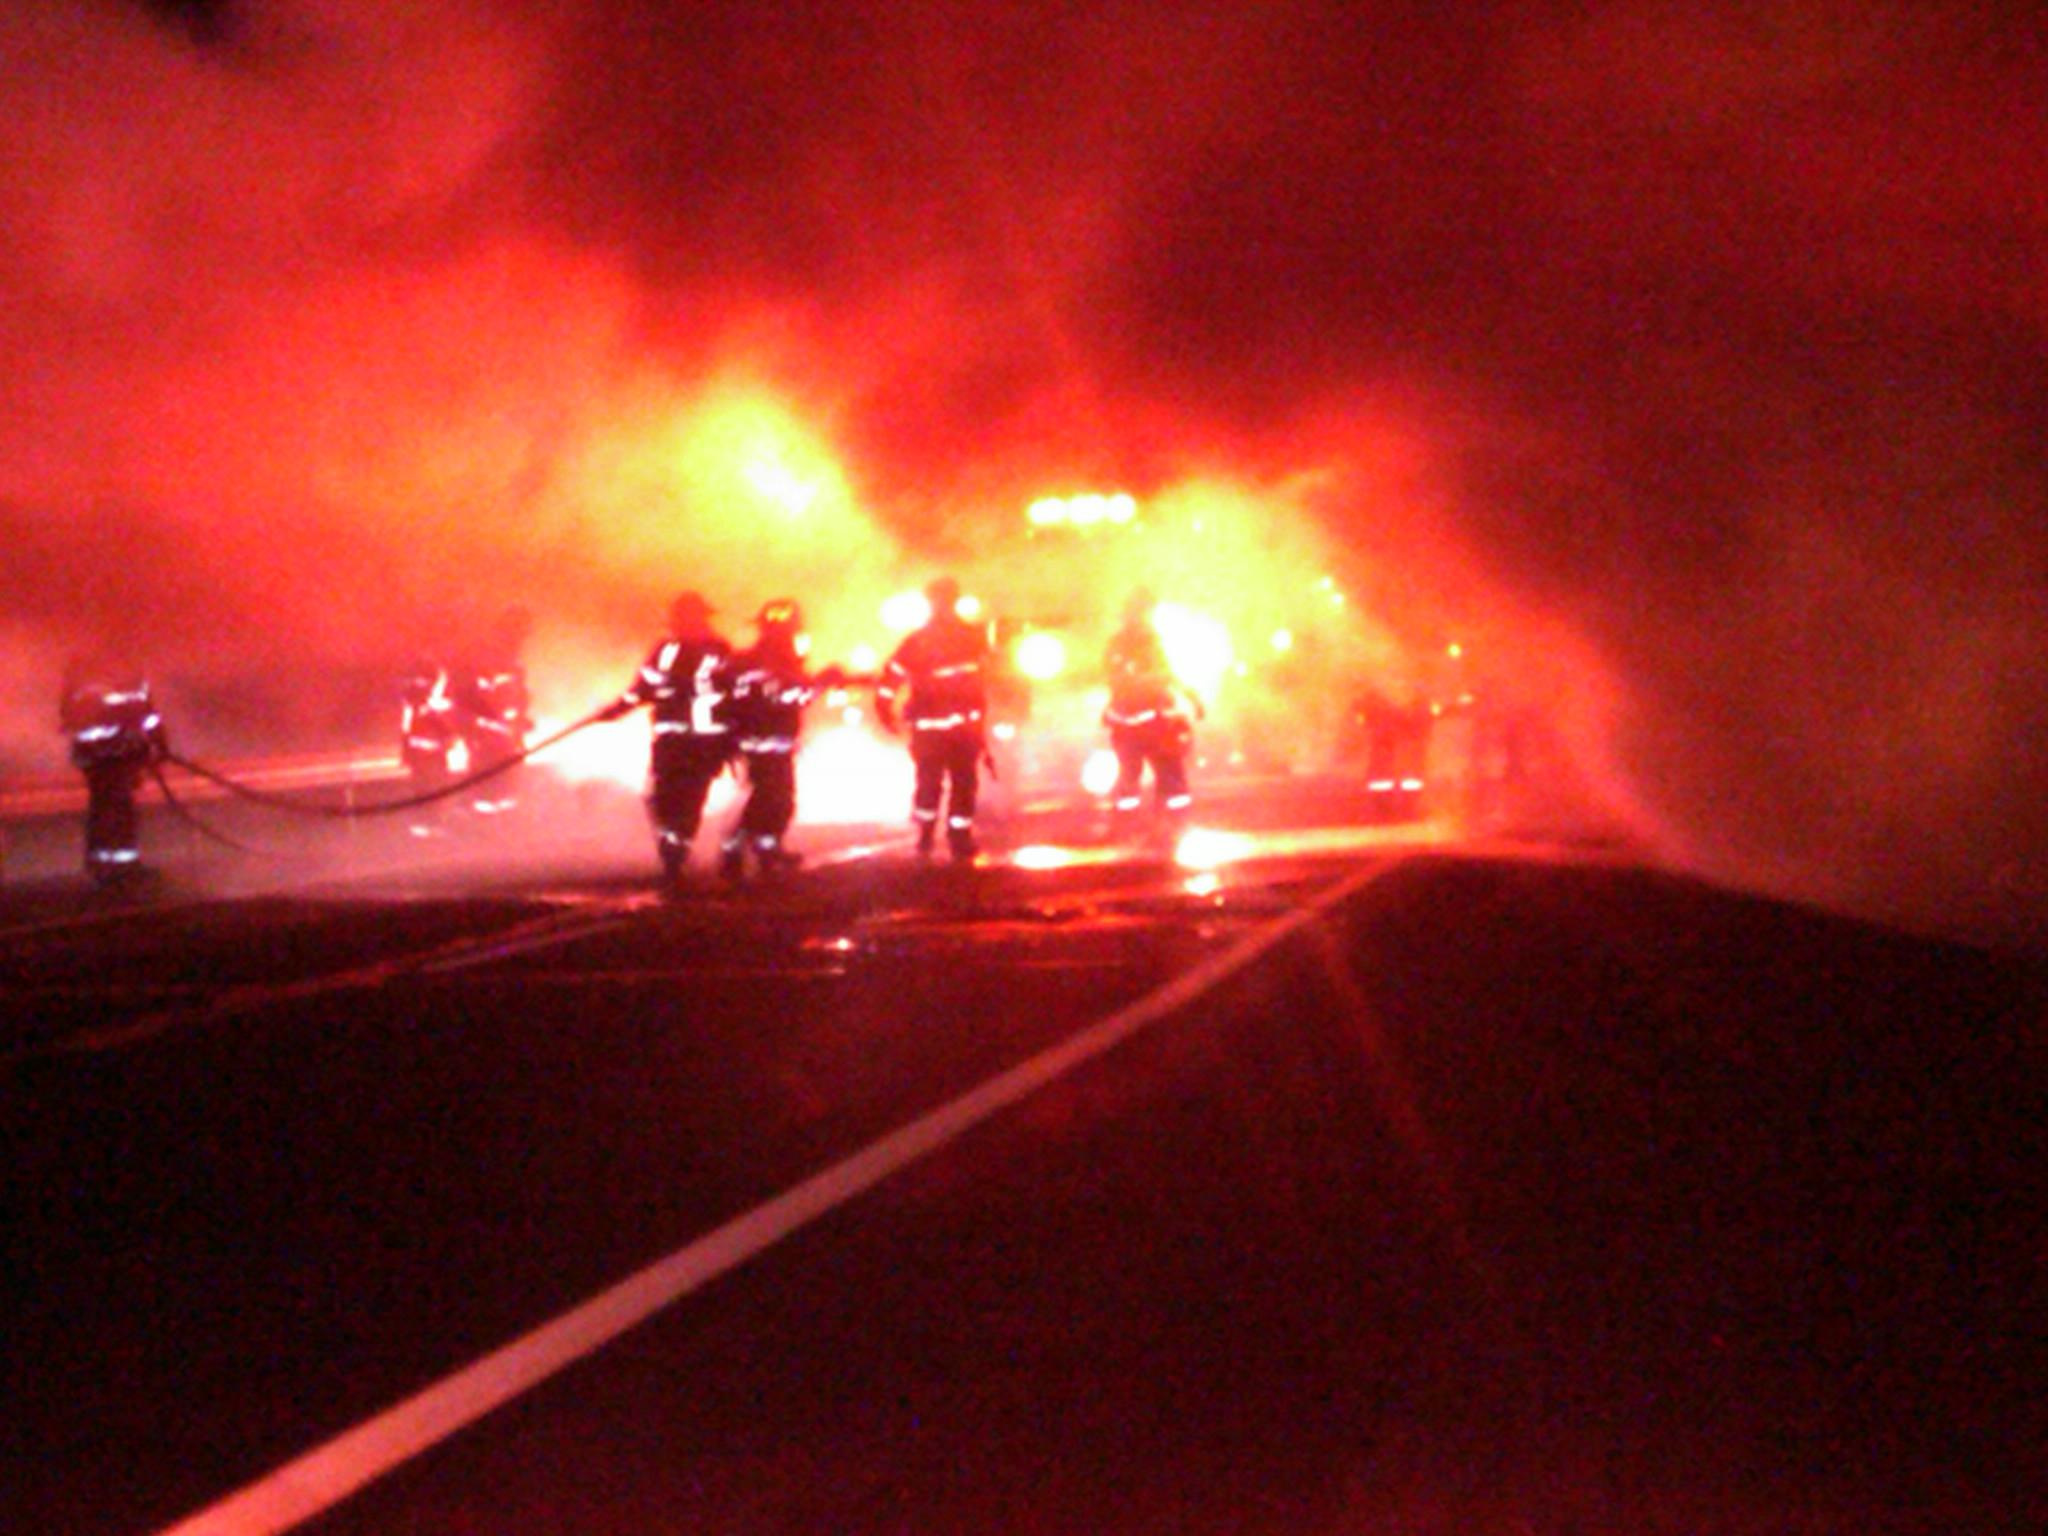 Box truck fire 12 6 2010